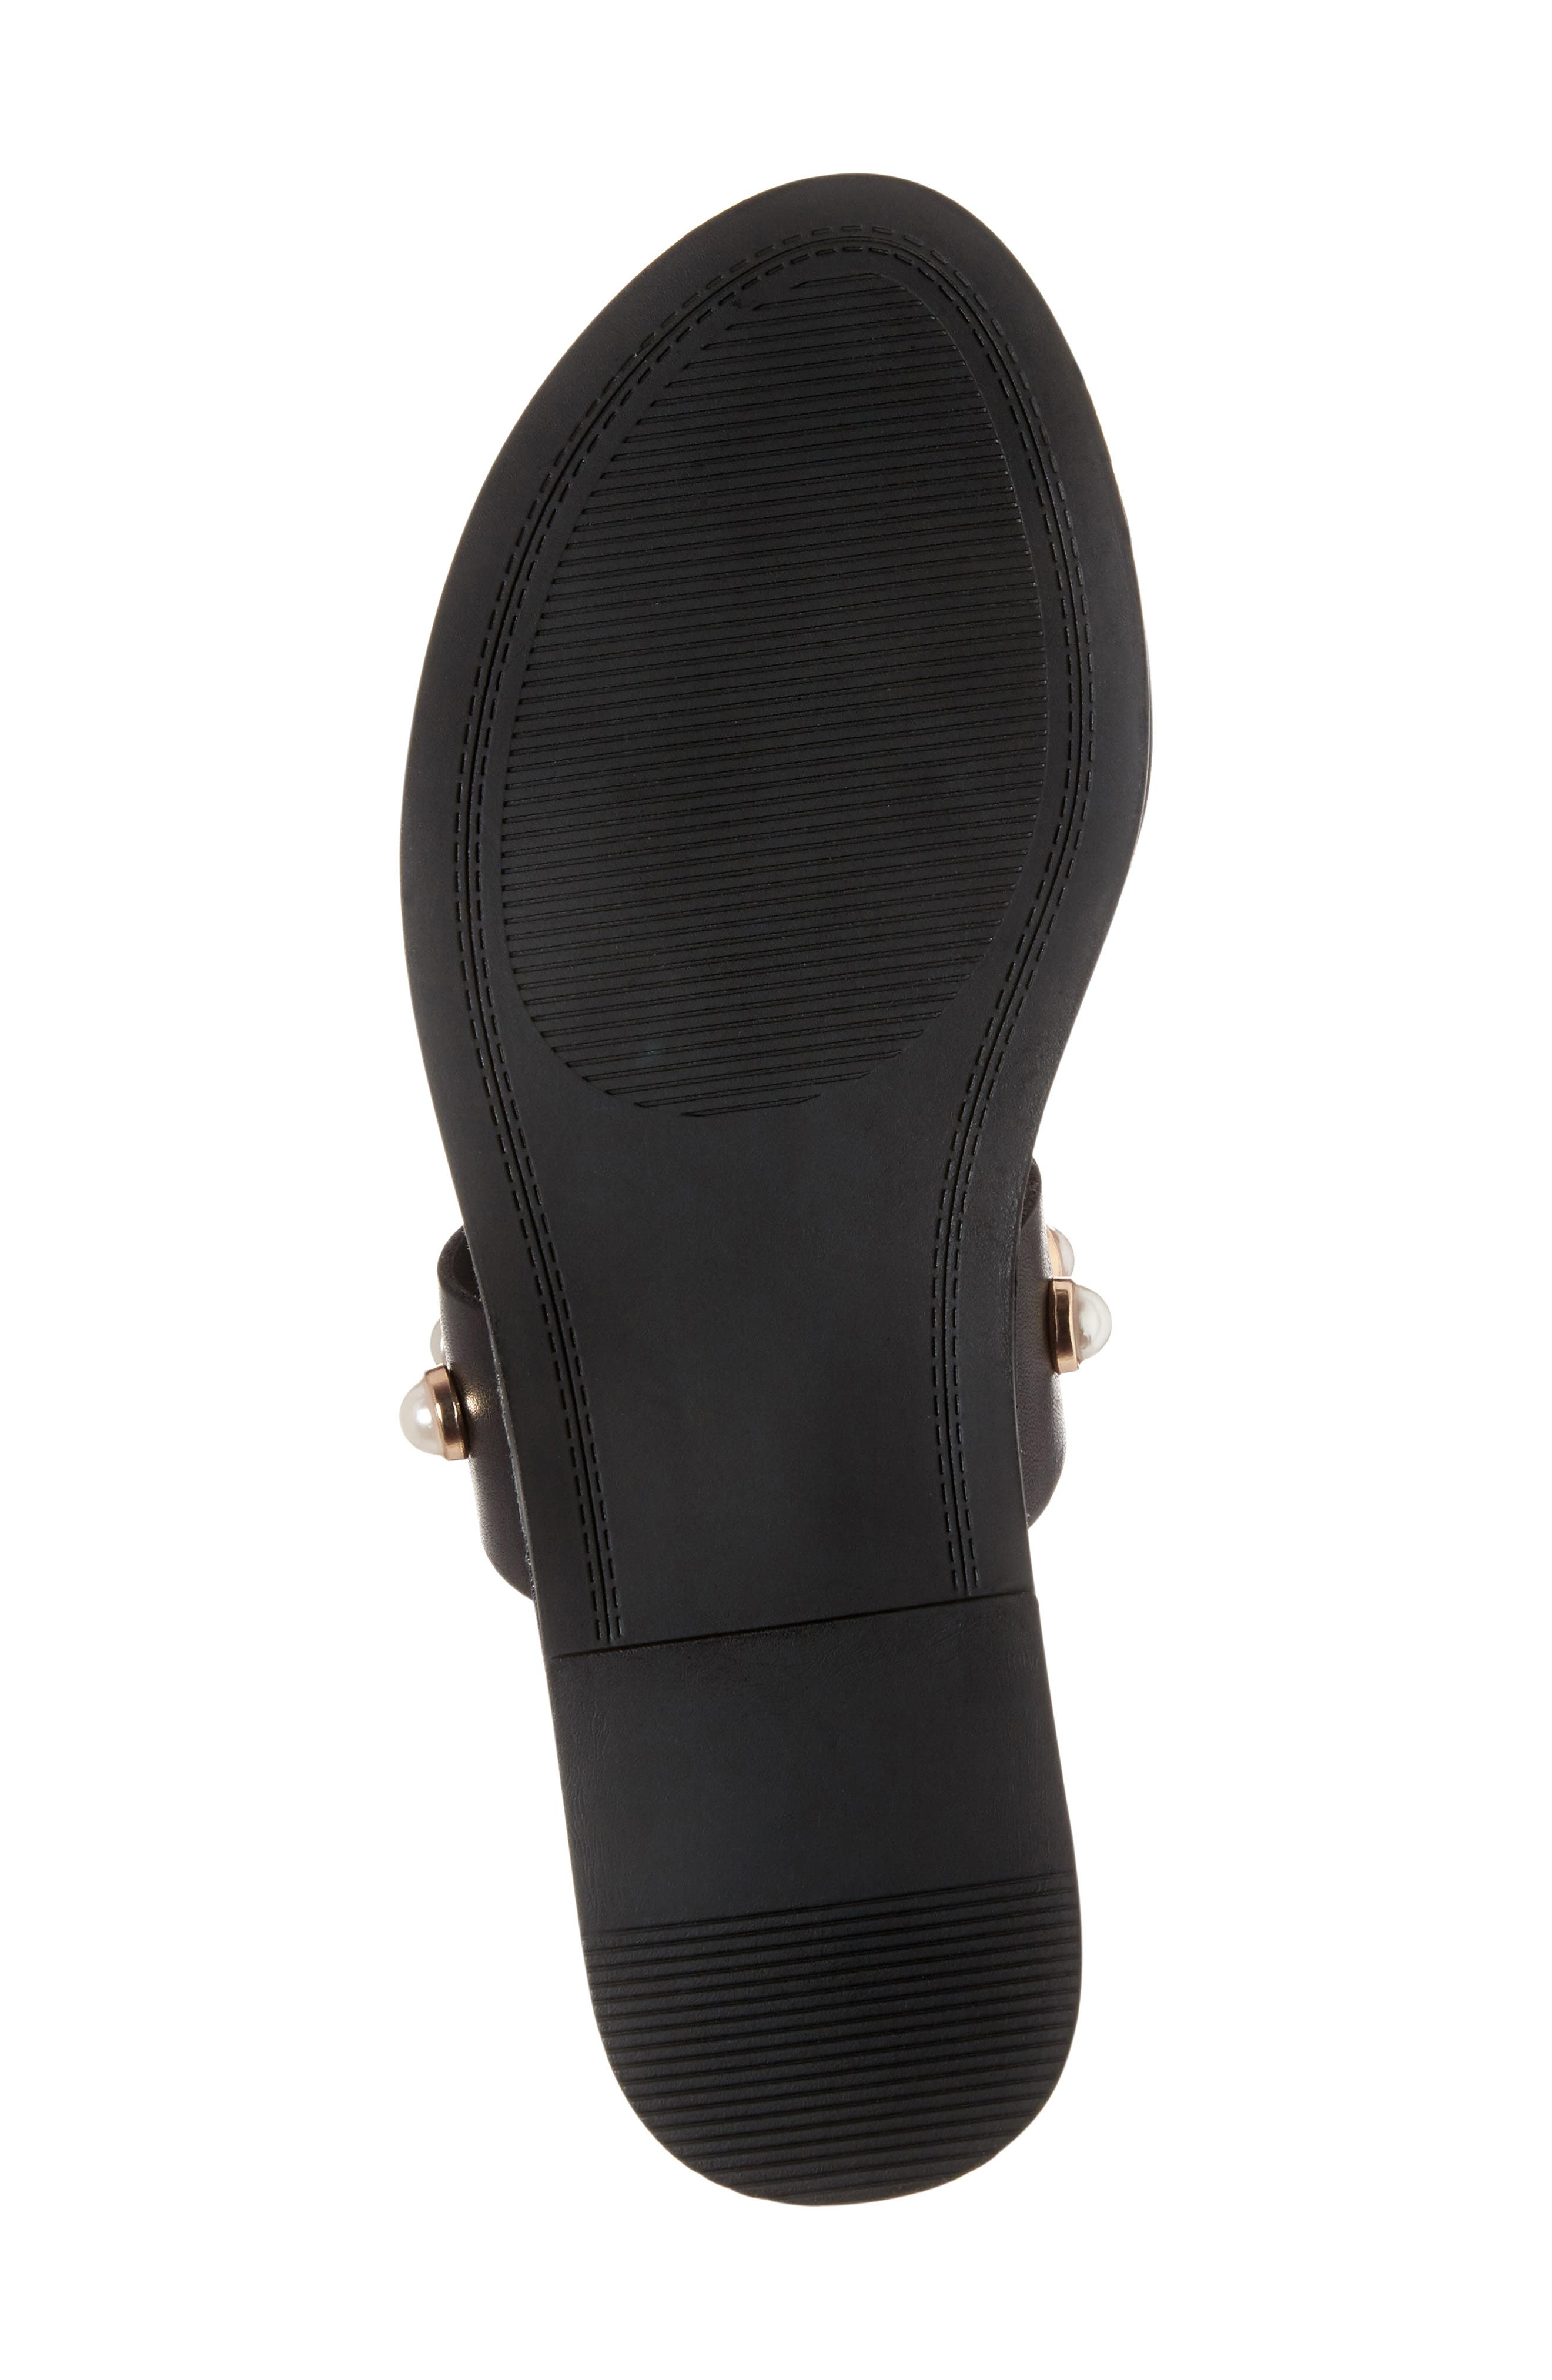 STEVE MADDEN, Jole Embellished Slide Sandal, Alternate thumbnail 6, color, 001